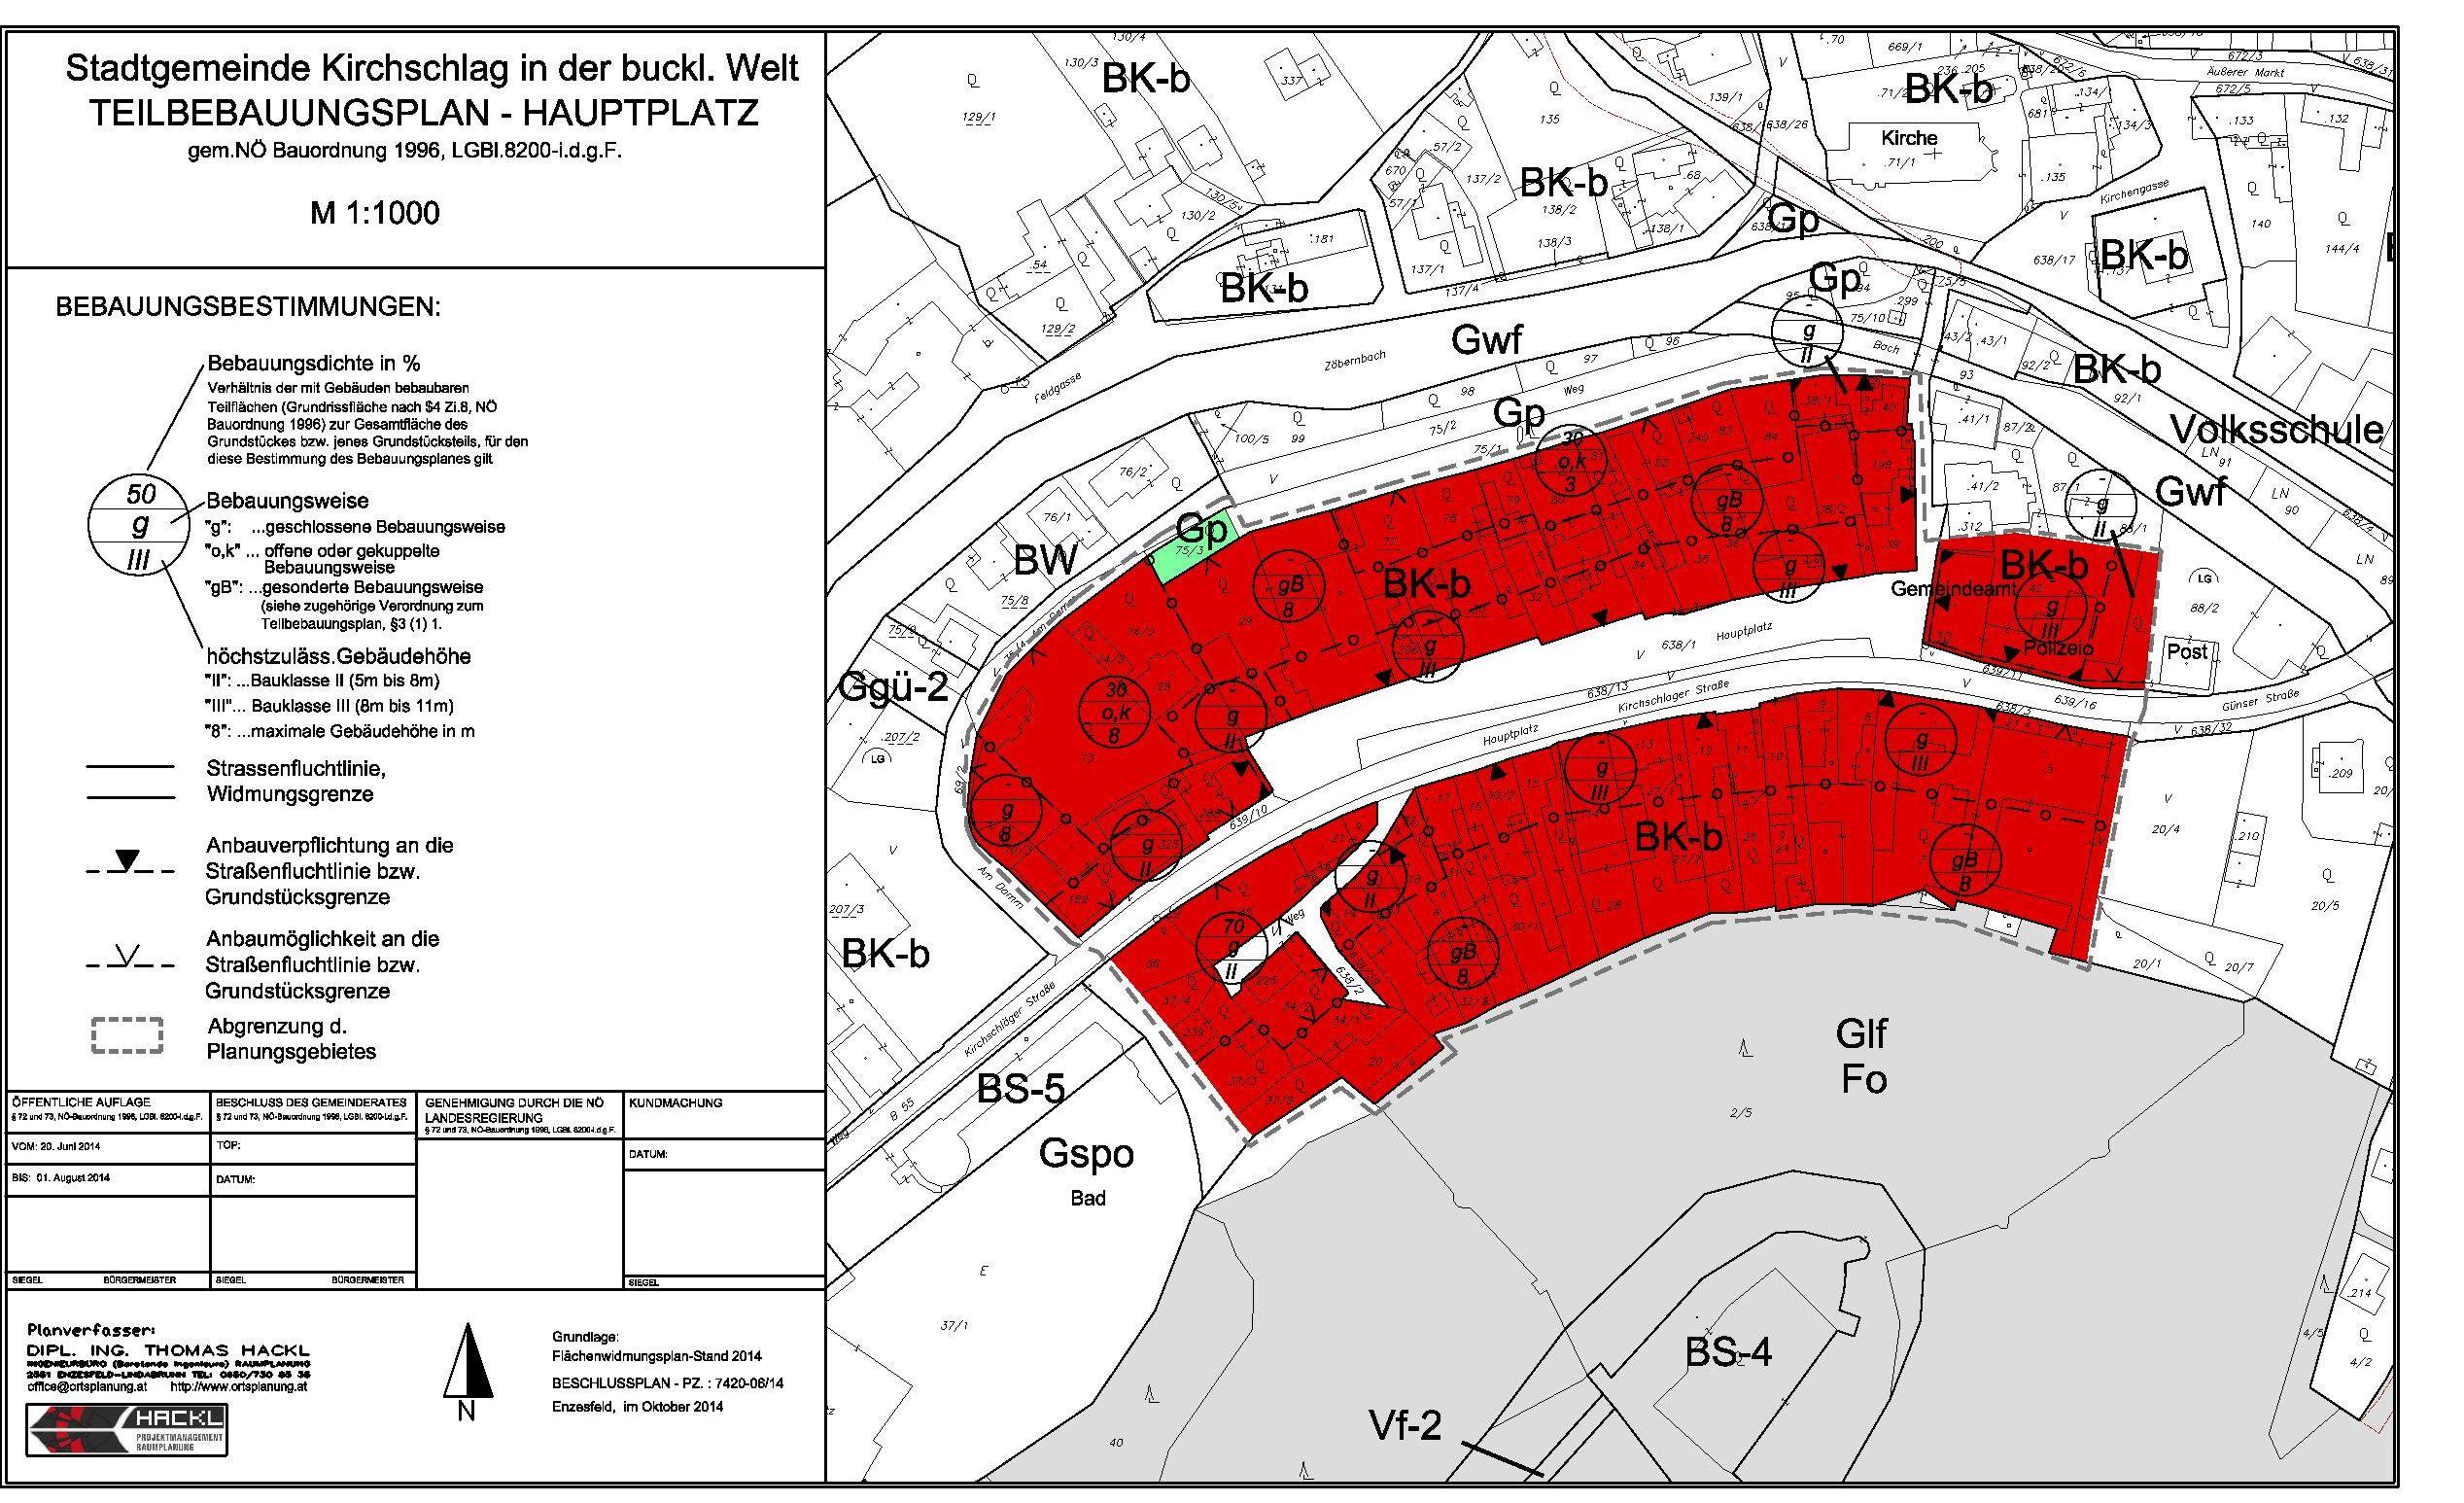 TBBPL-Hauptplatz-BESCHLUSS Layout1 (1)